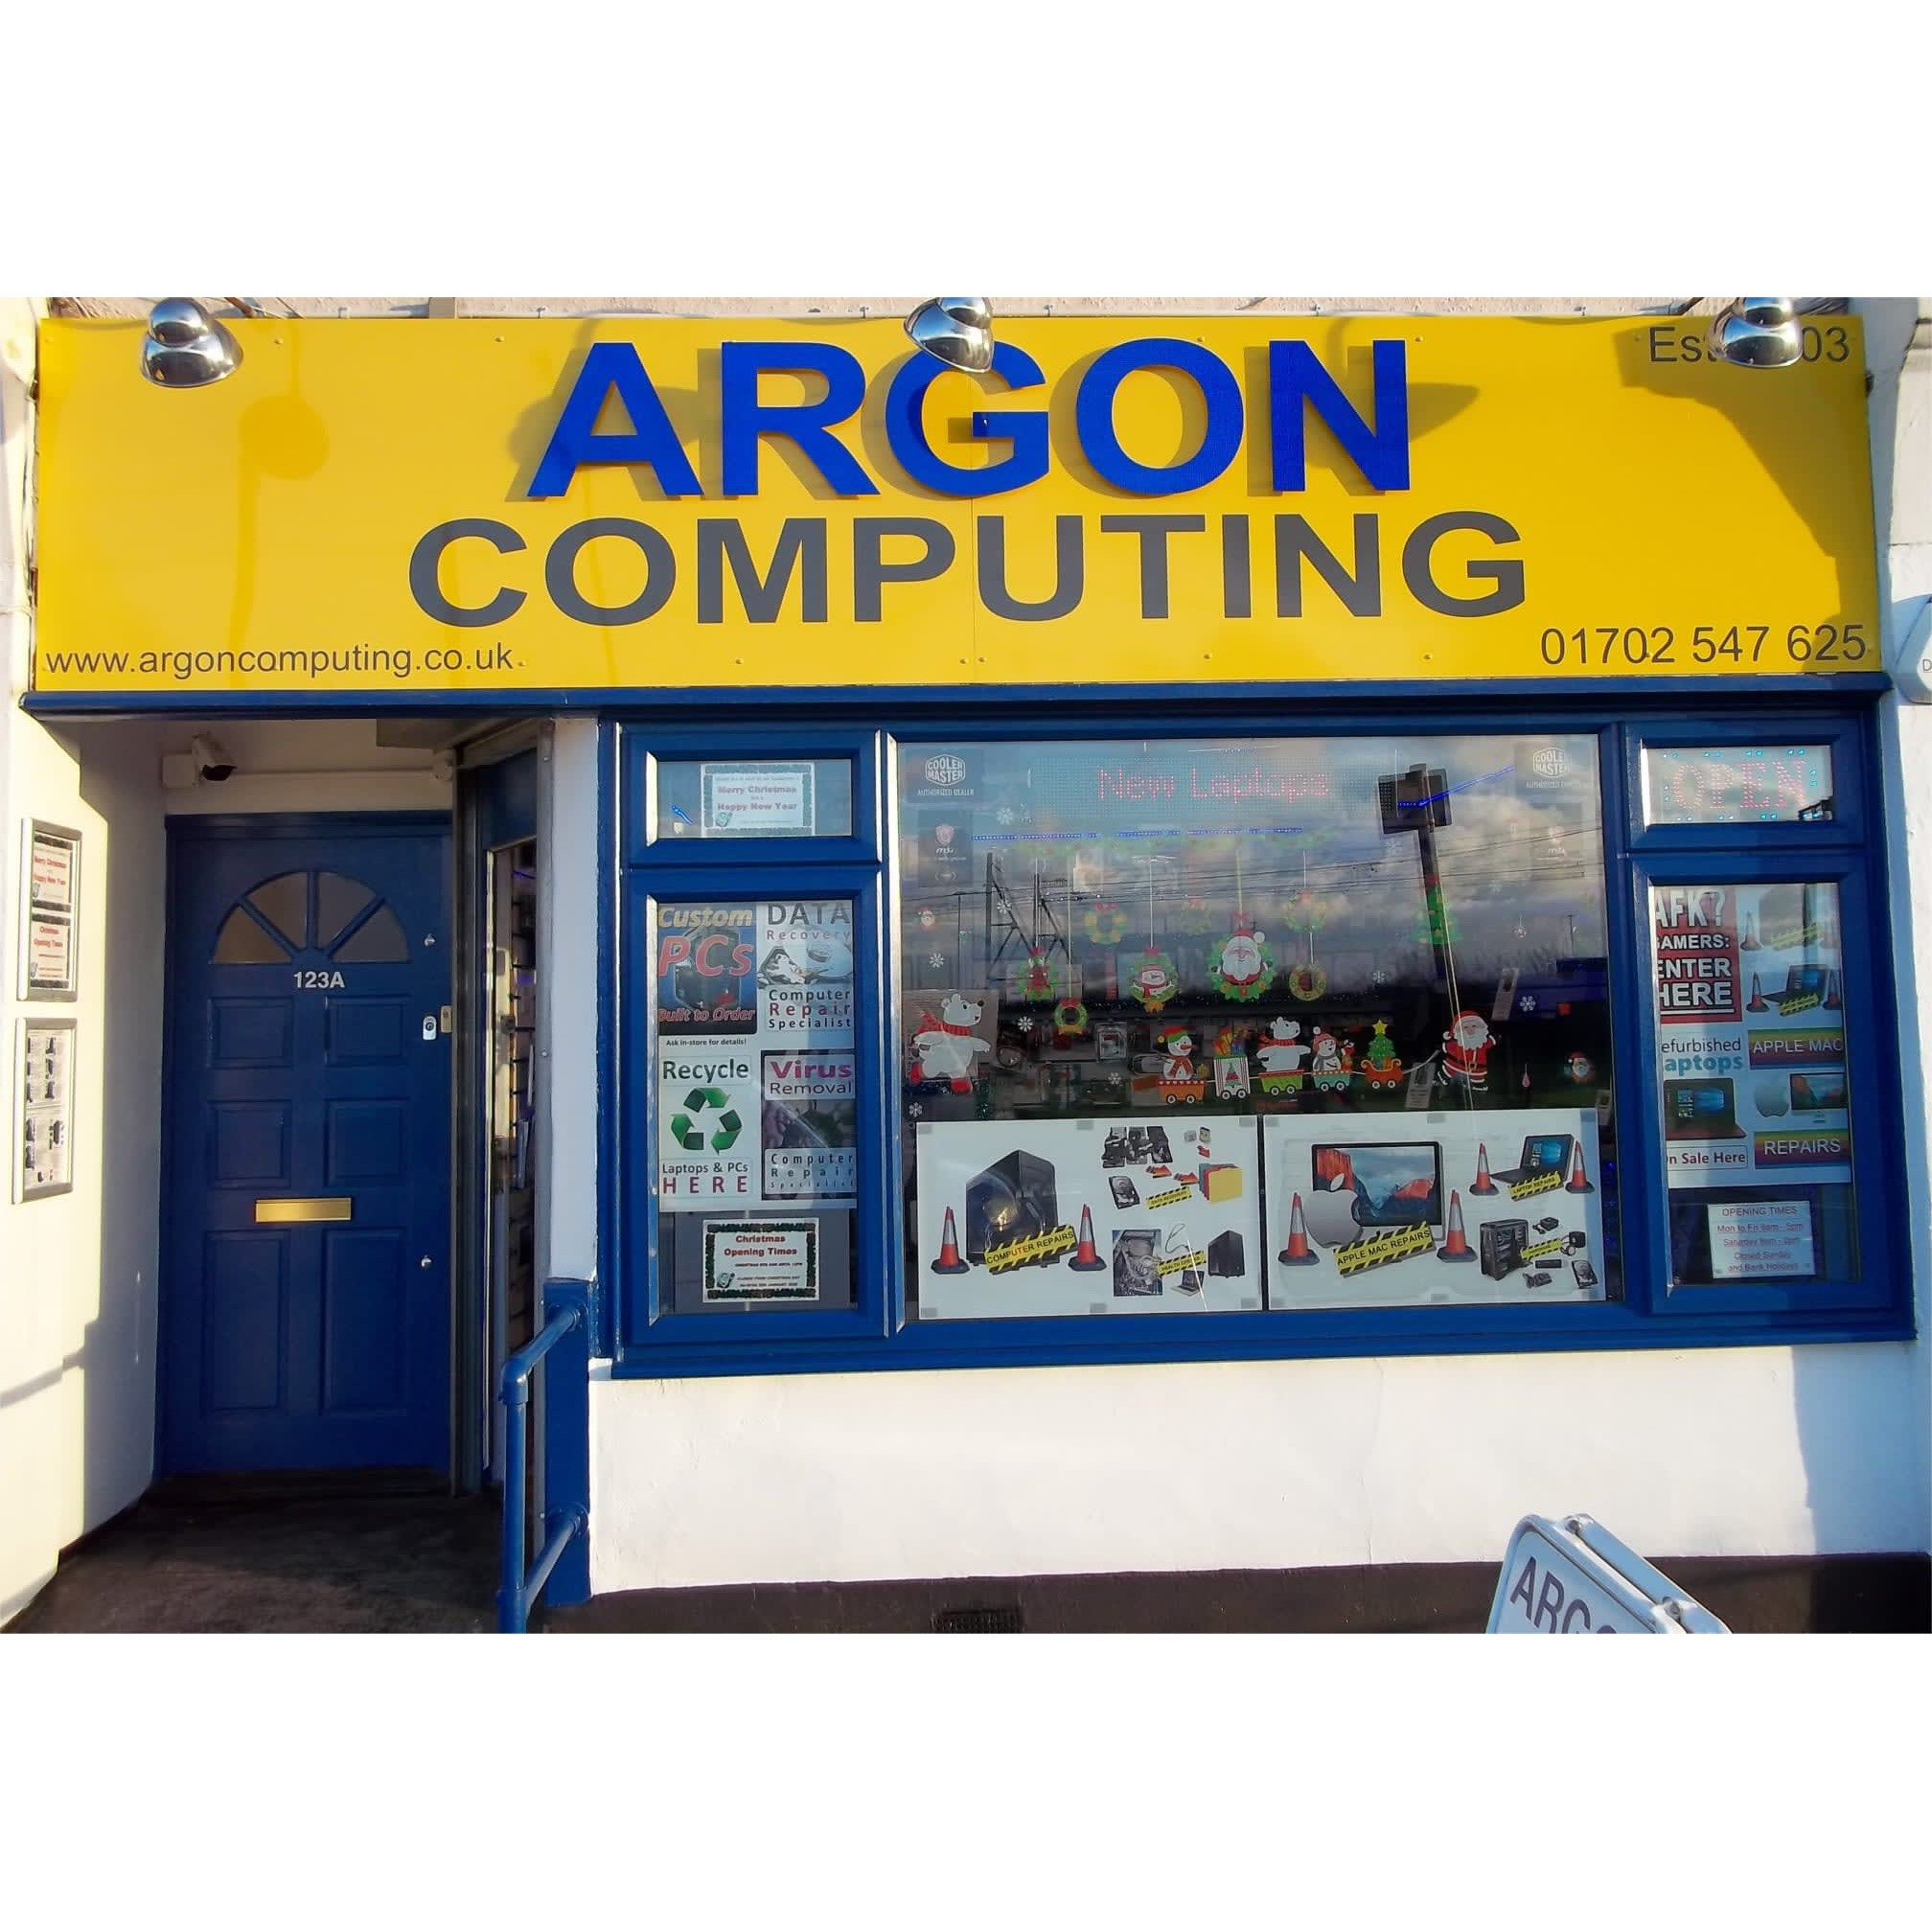 Argon Computing Ltd